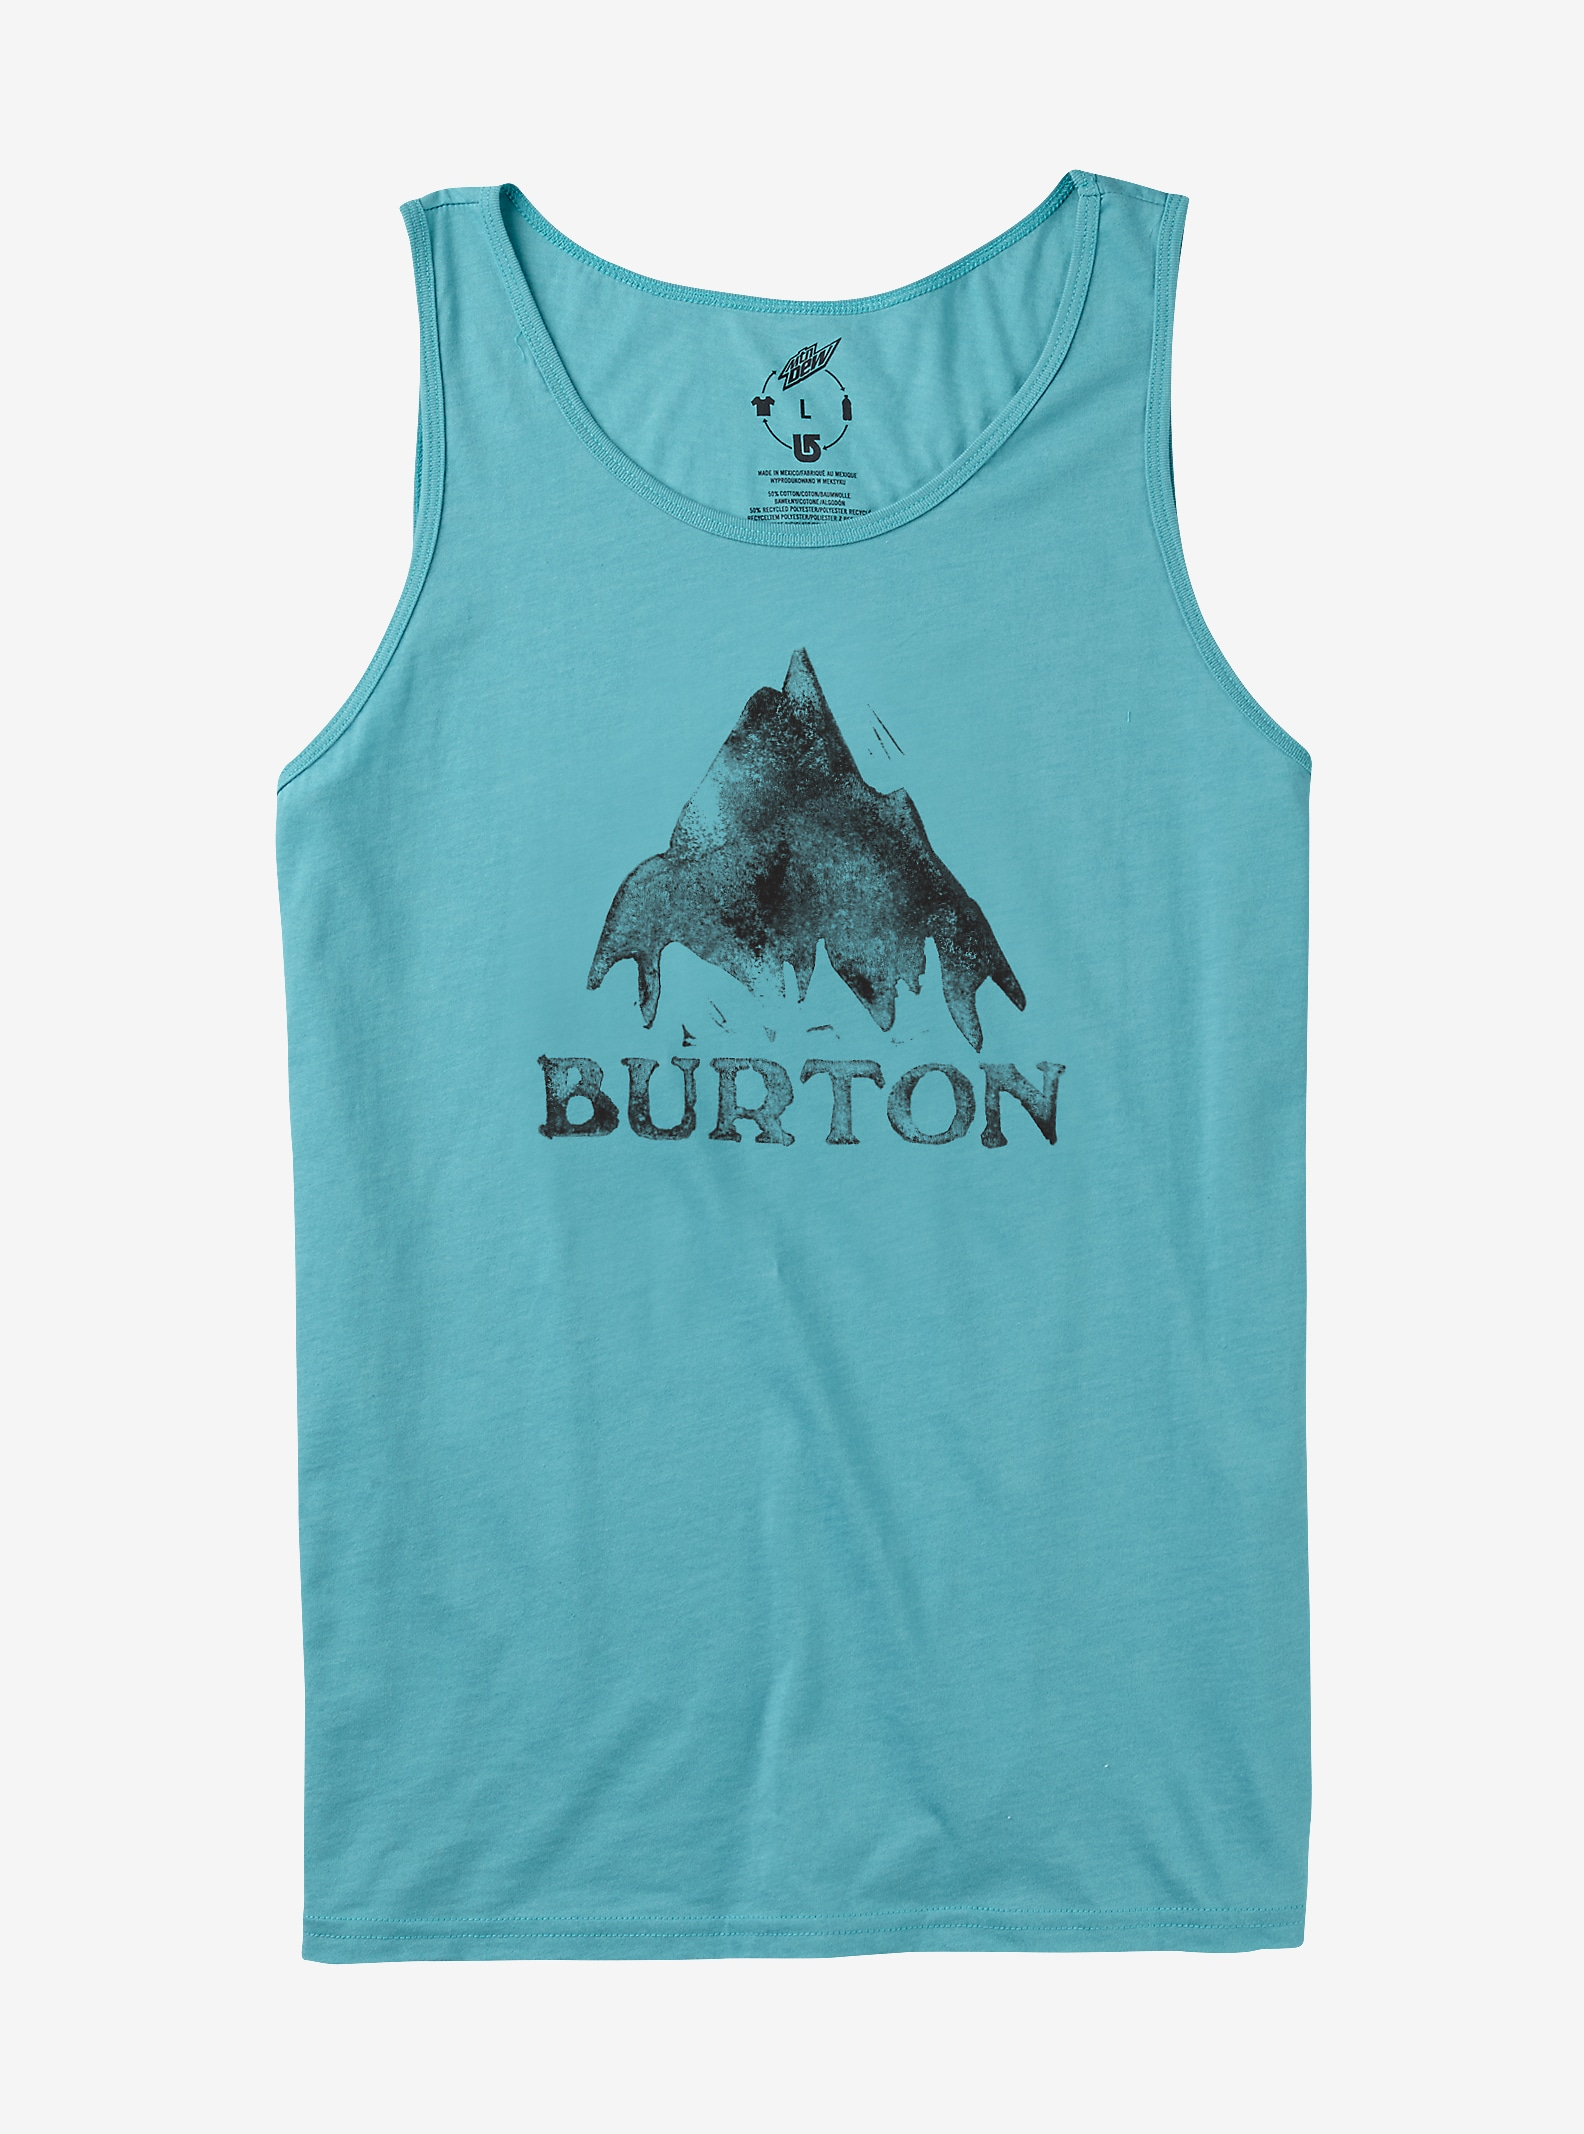 Burton - Débardeur recyclé Stamped Mountain affichage en Dusty Blue Heather